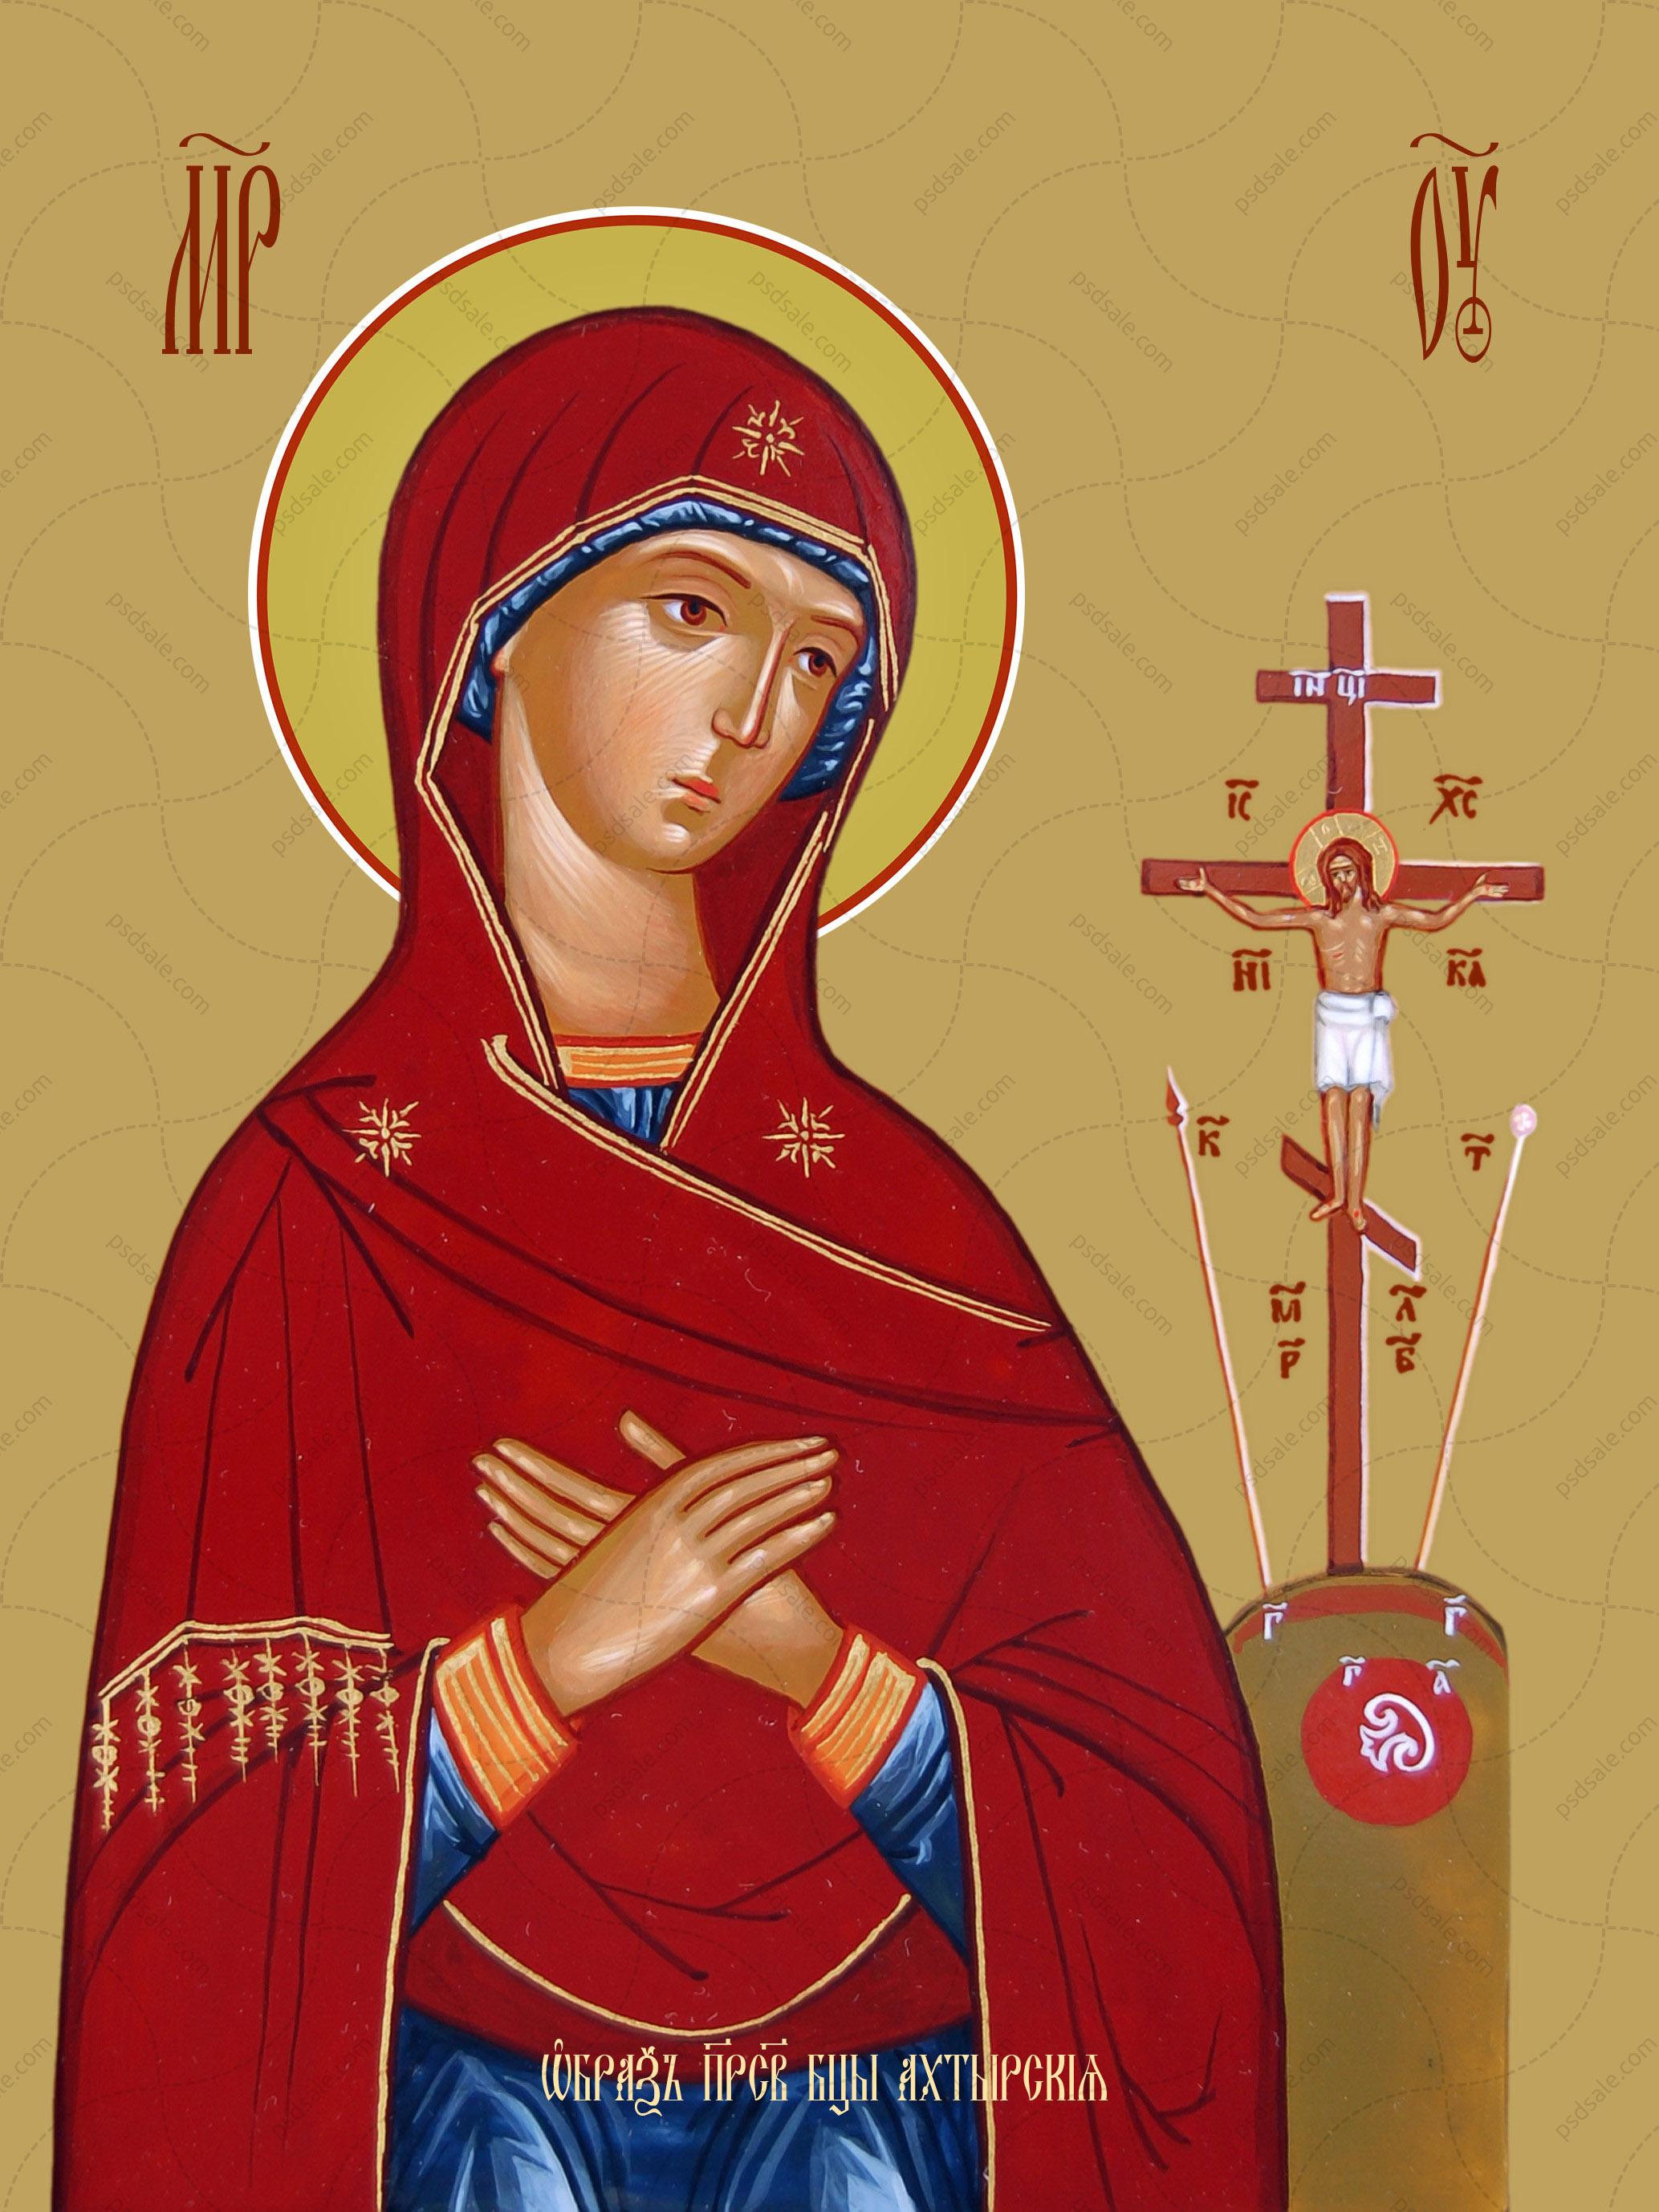 Ахтырская икона божьей матери